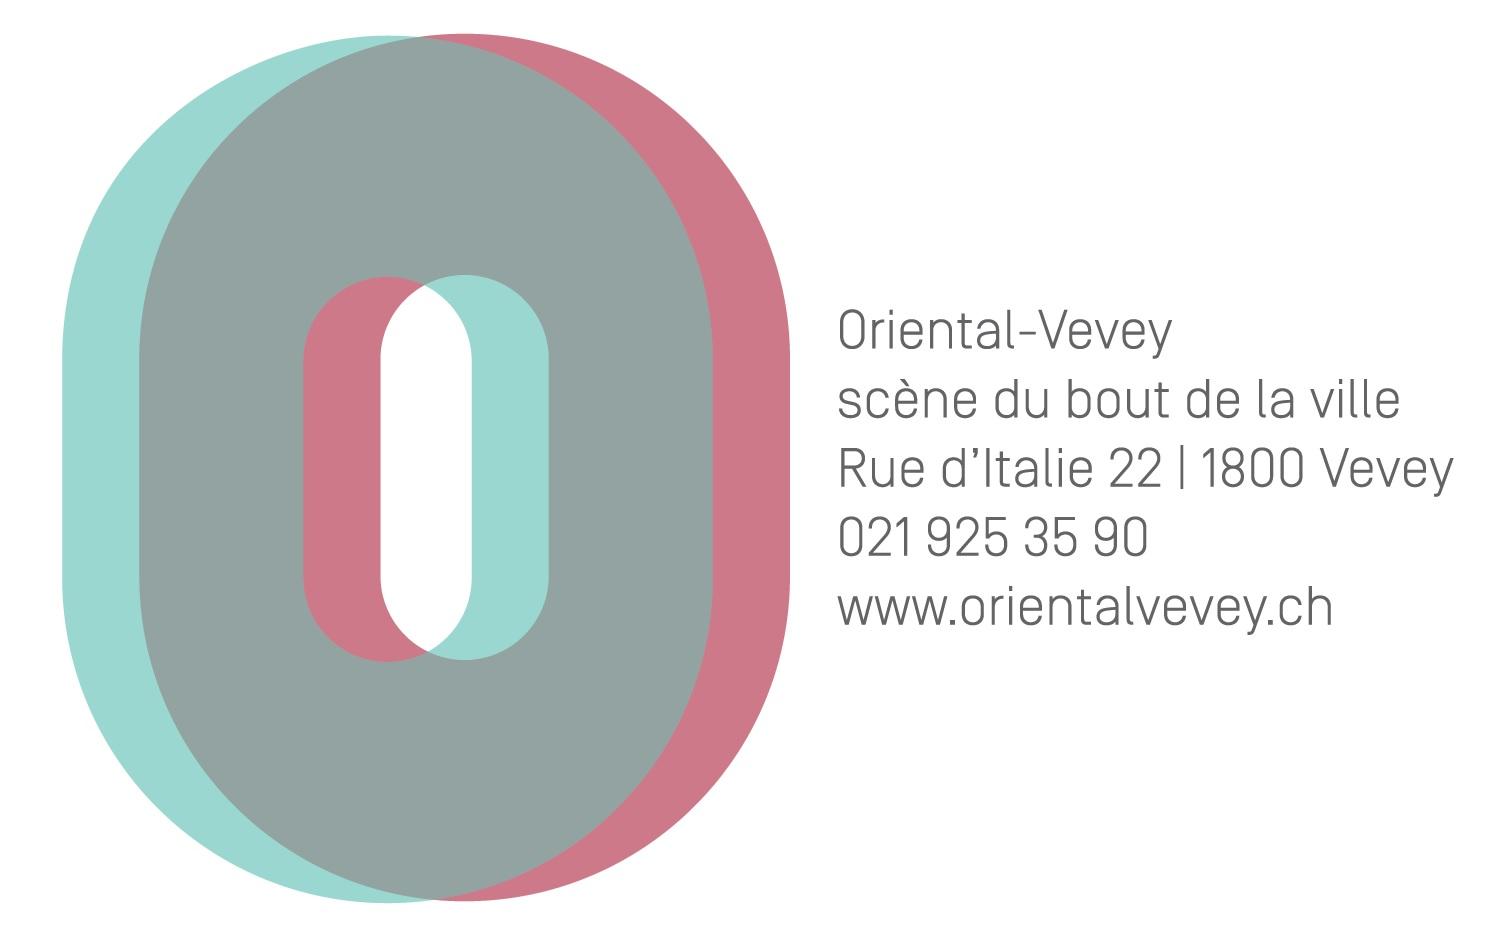 Oriental-Vevey